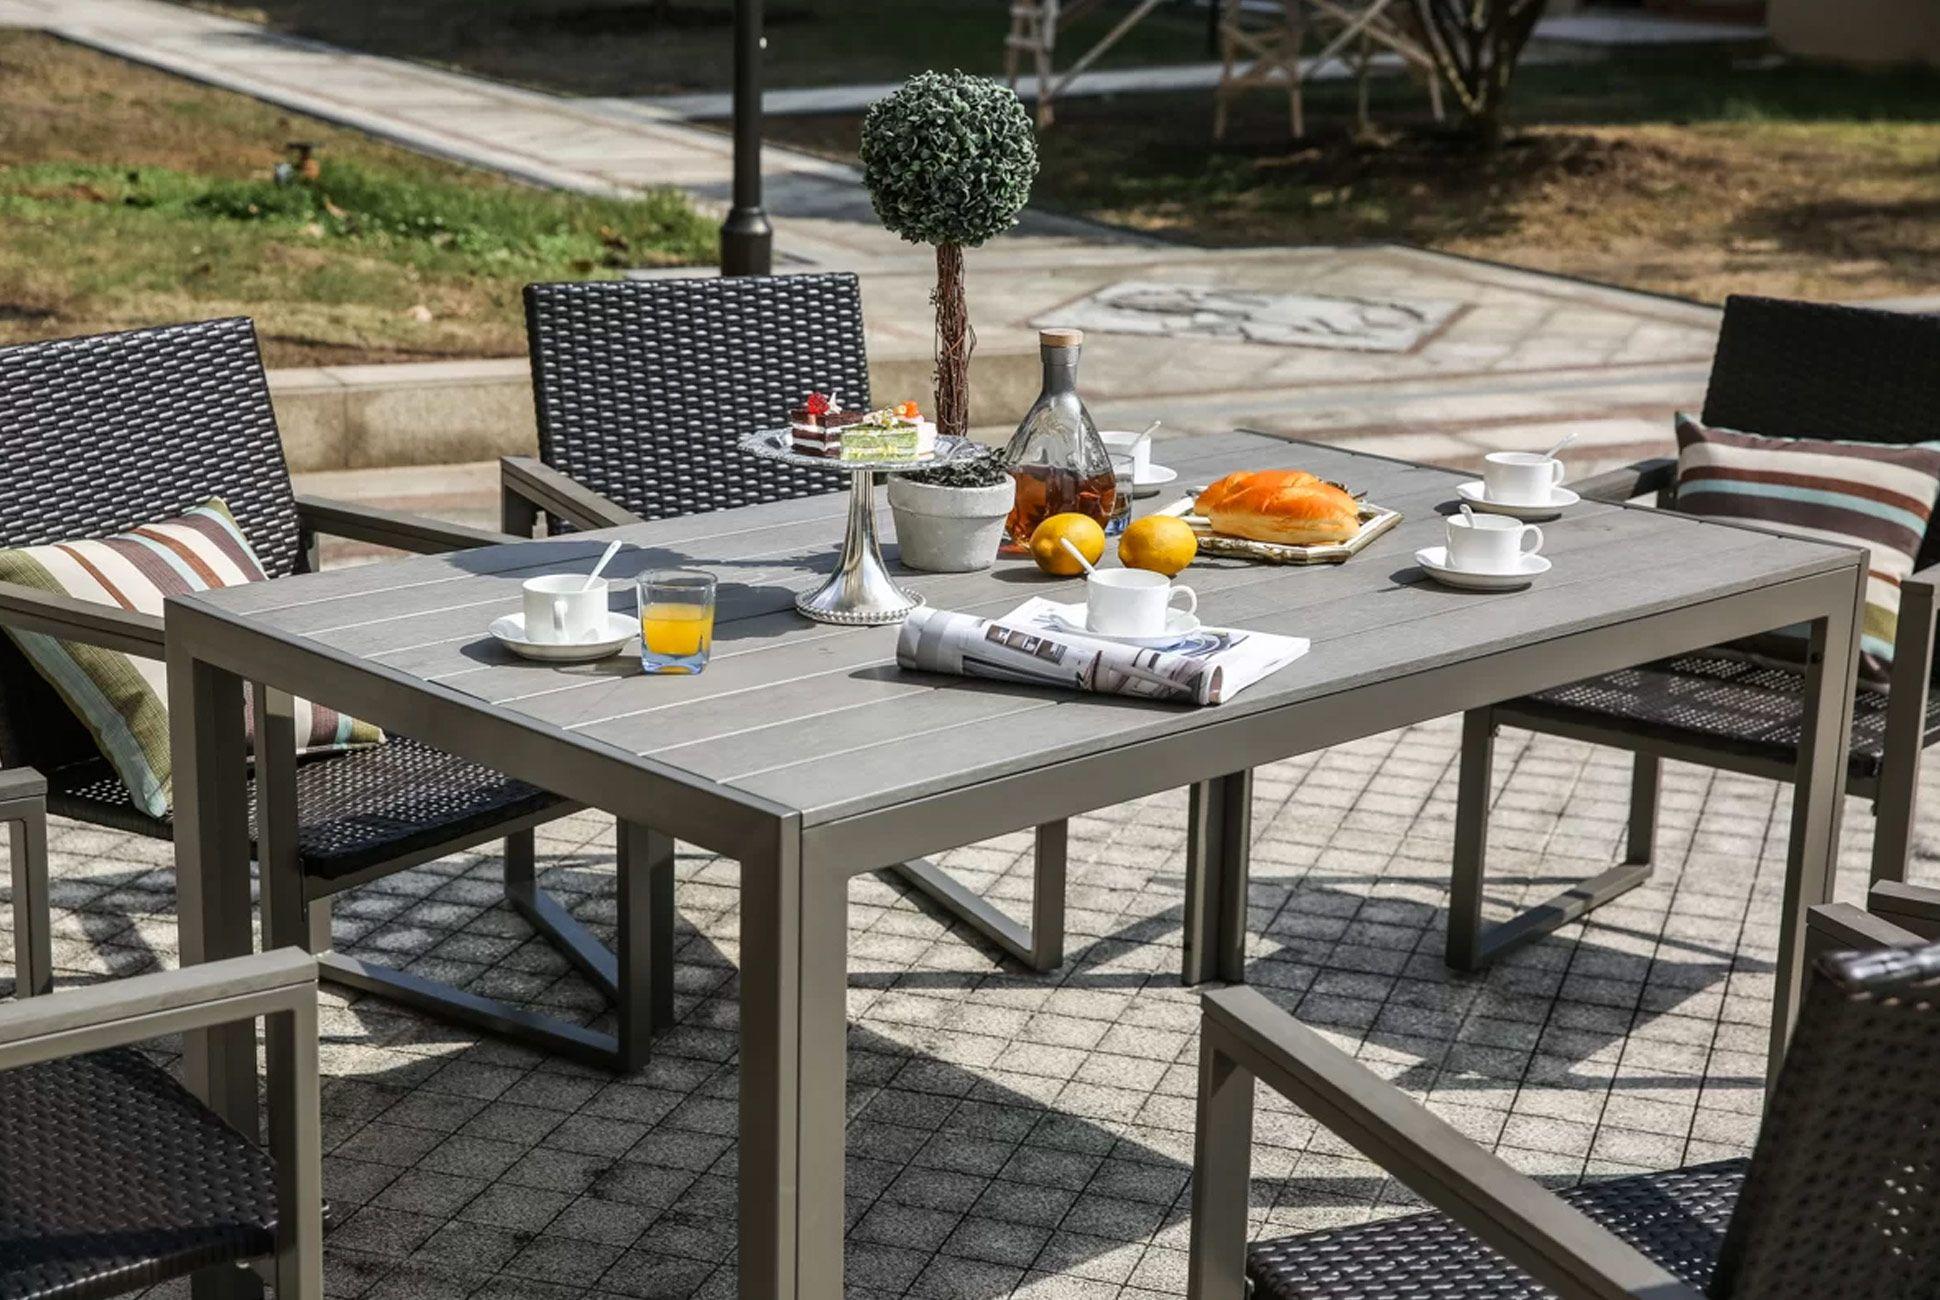 Peachy Save 65 On Outdoor Furniture With Wayfairs July 4Th Creativecarmelina Interior Chair Design Creativecarmelinacom